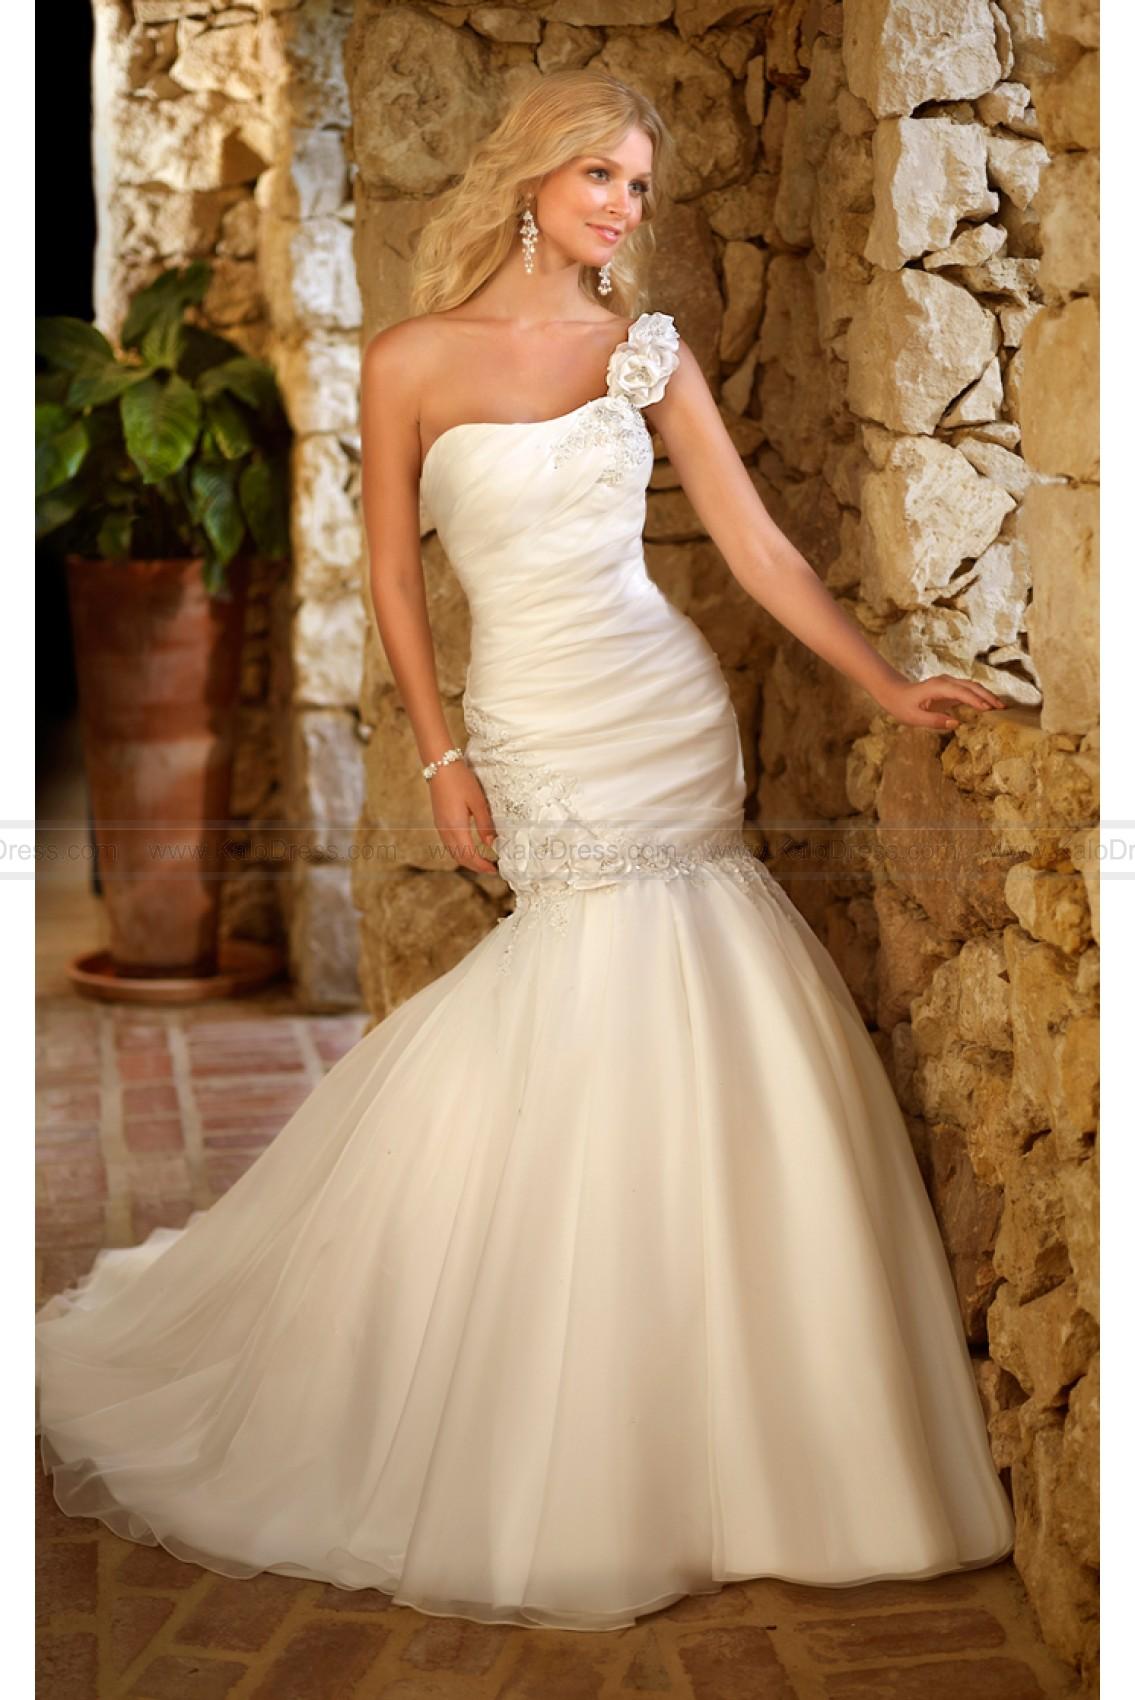 Stella York by Ella Bridals Bridal Gown STYLE 5683 - Informal Wedding Dresses